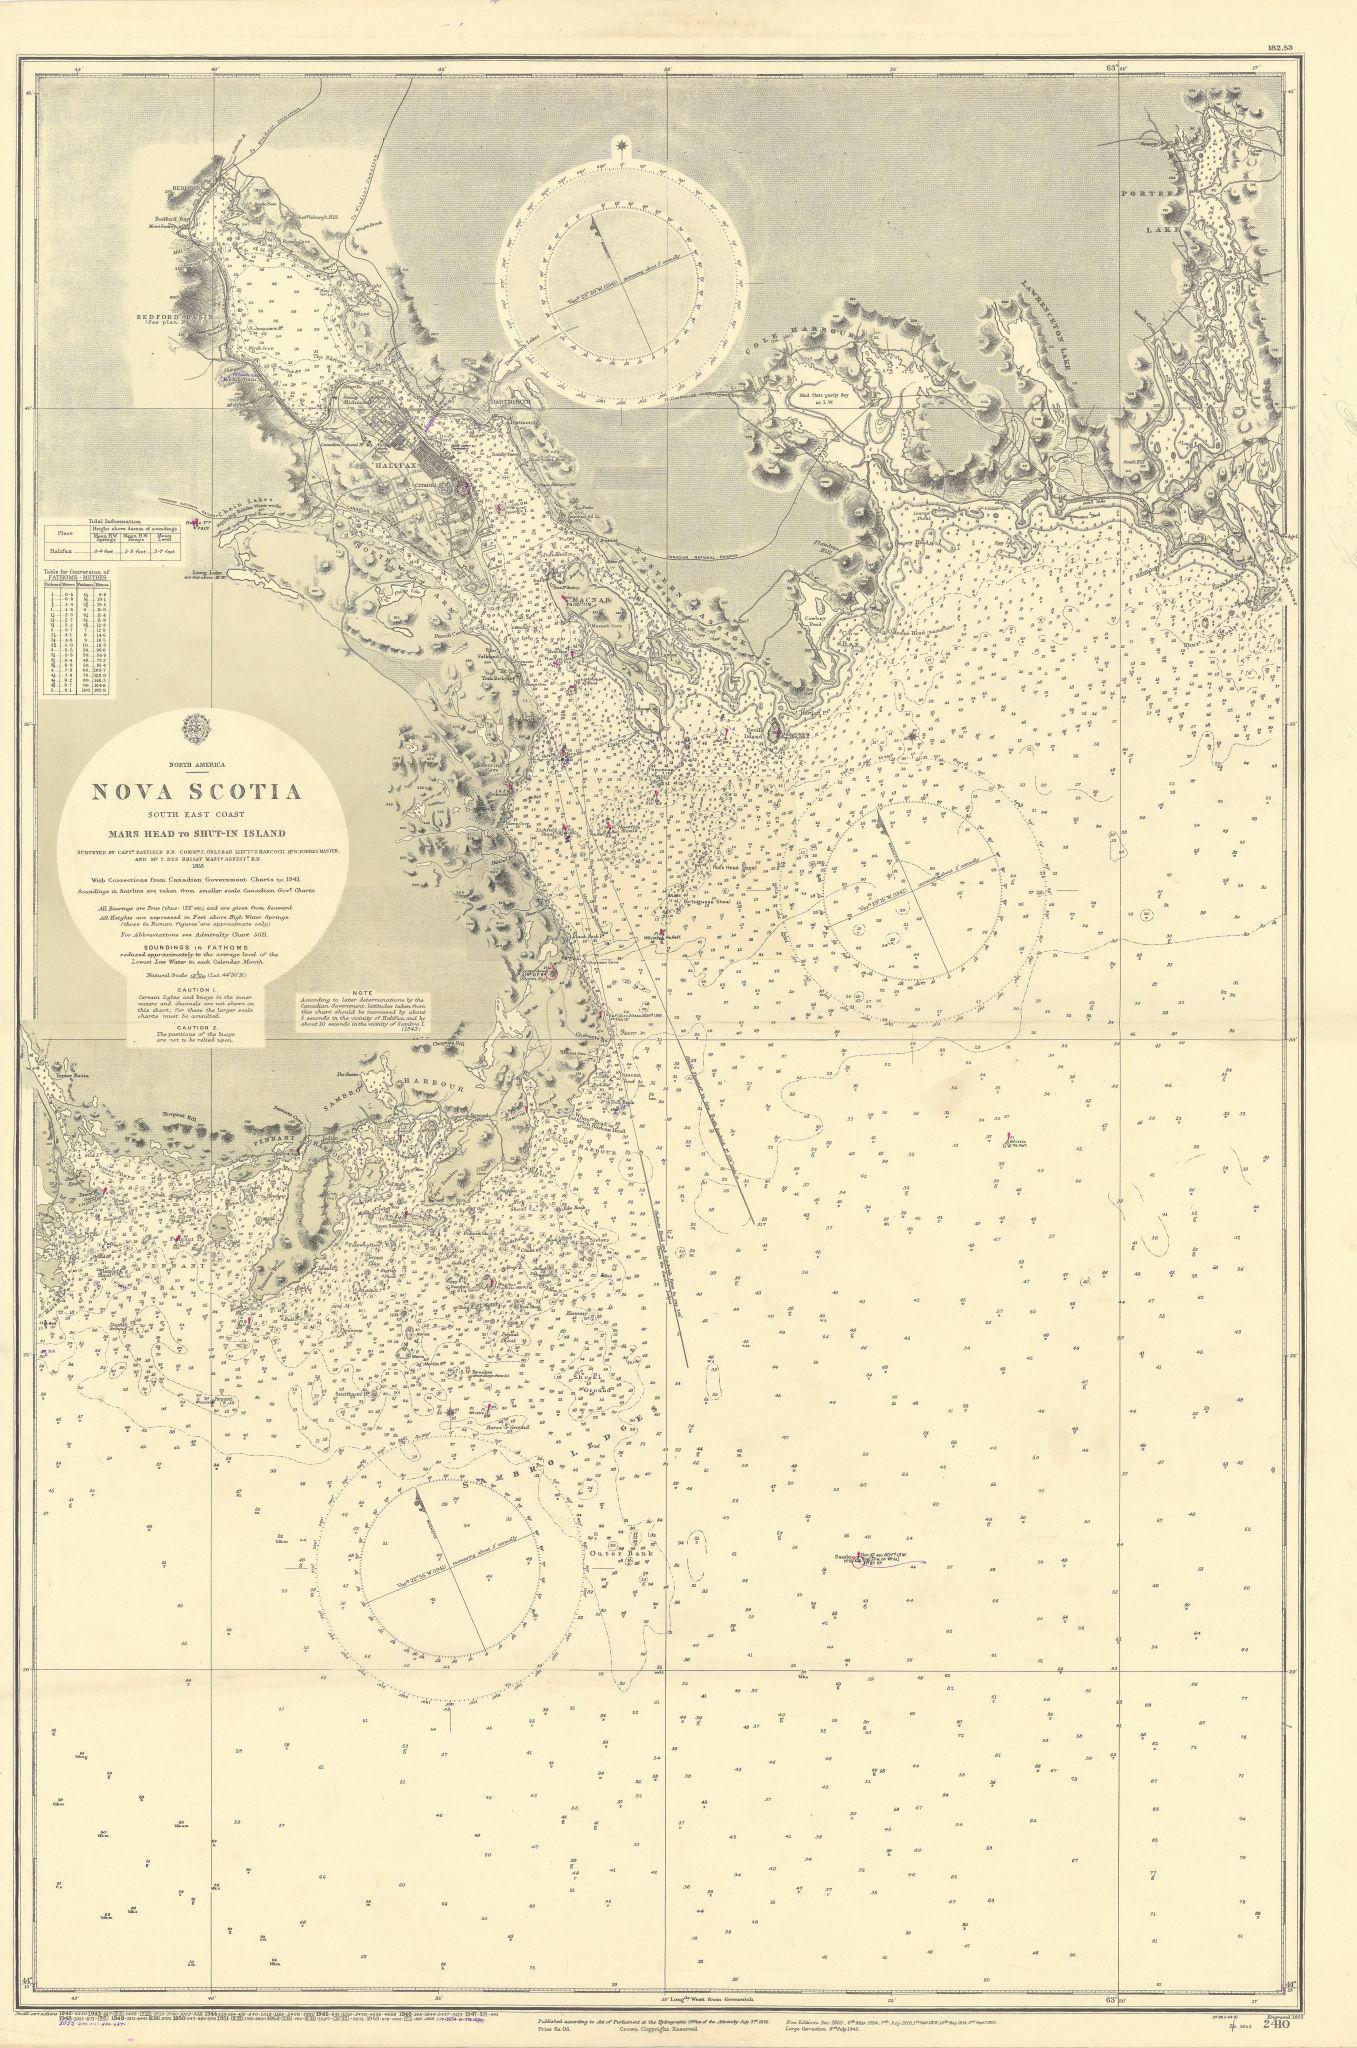 Nova Scotia Mars Head-Shut-in Island Halifax ADMIRALTY chart 1855 (1955) map